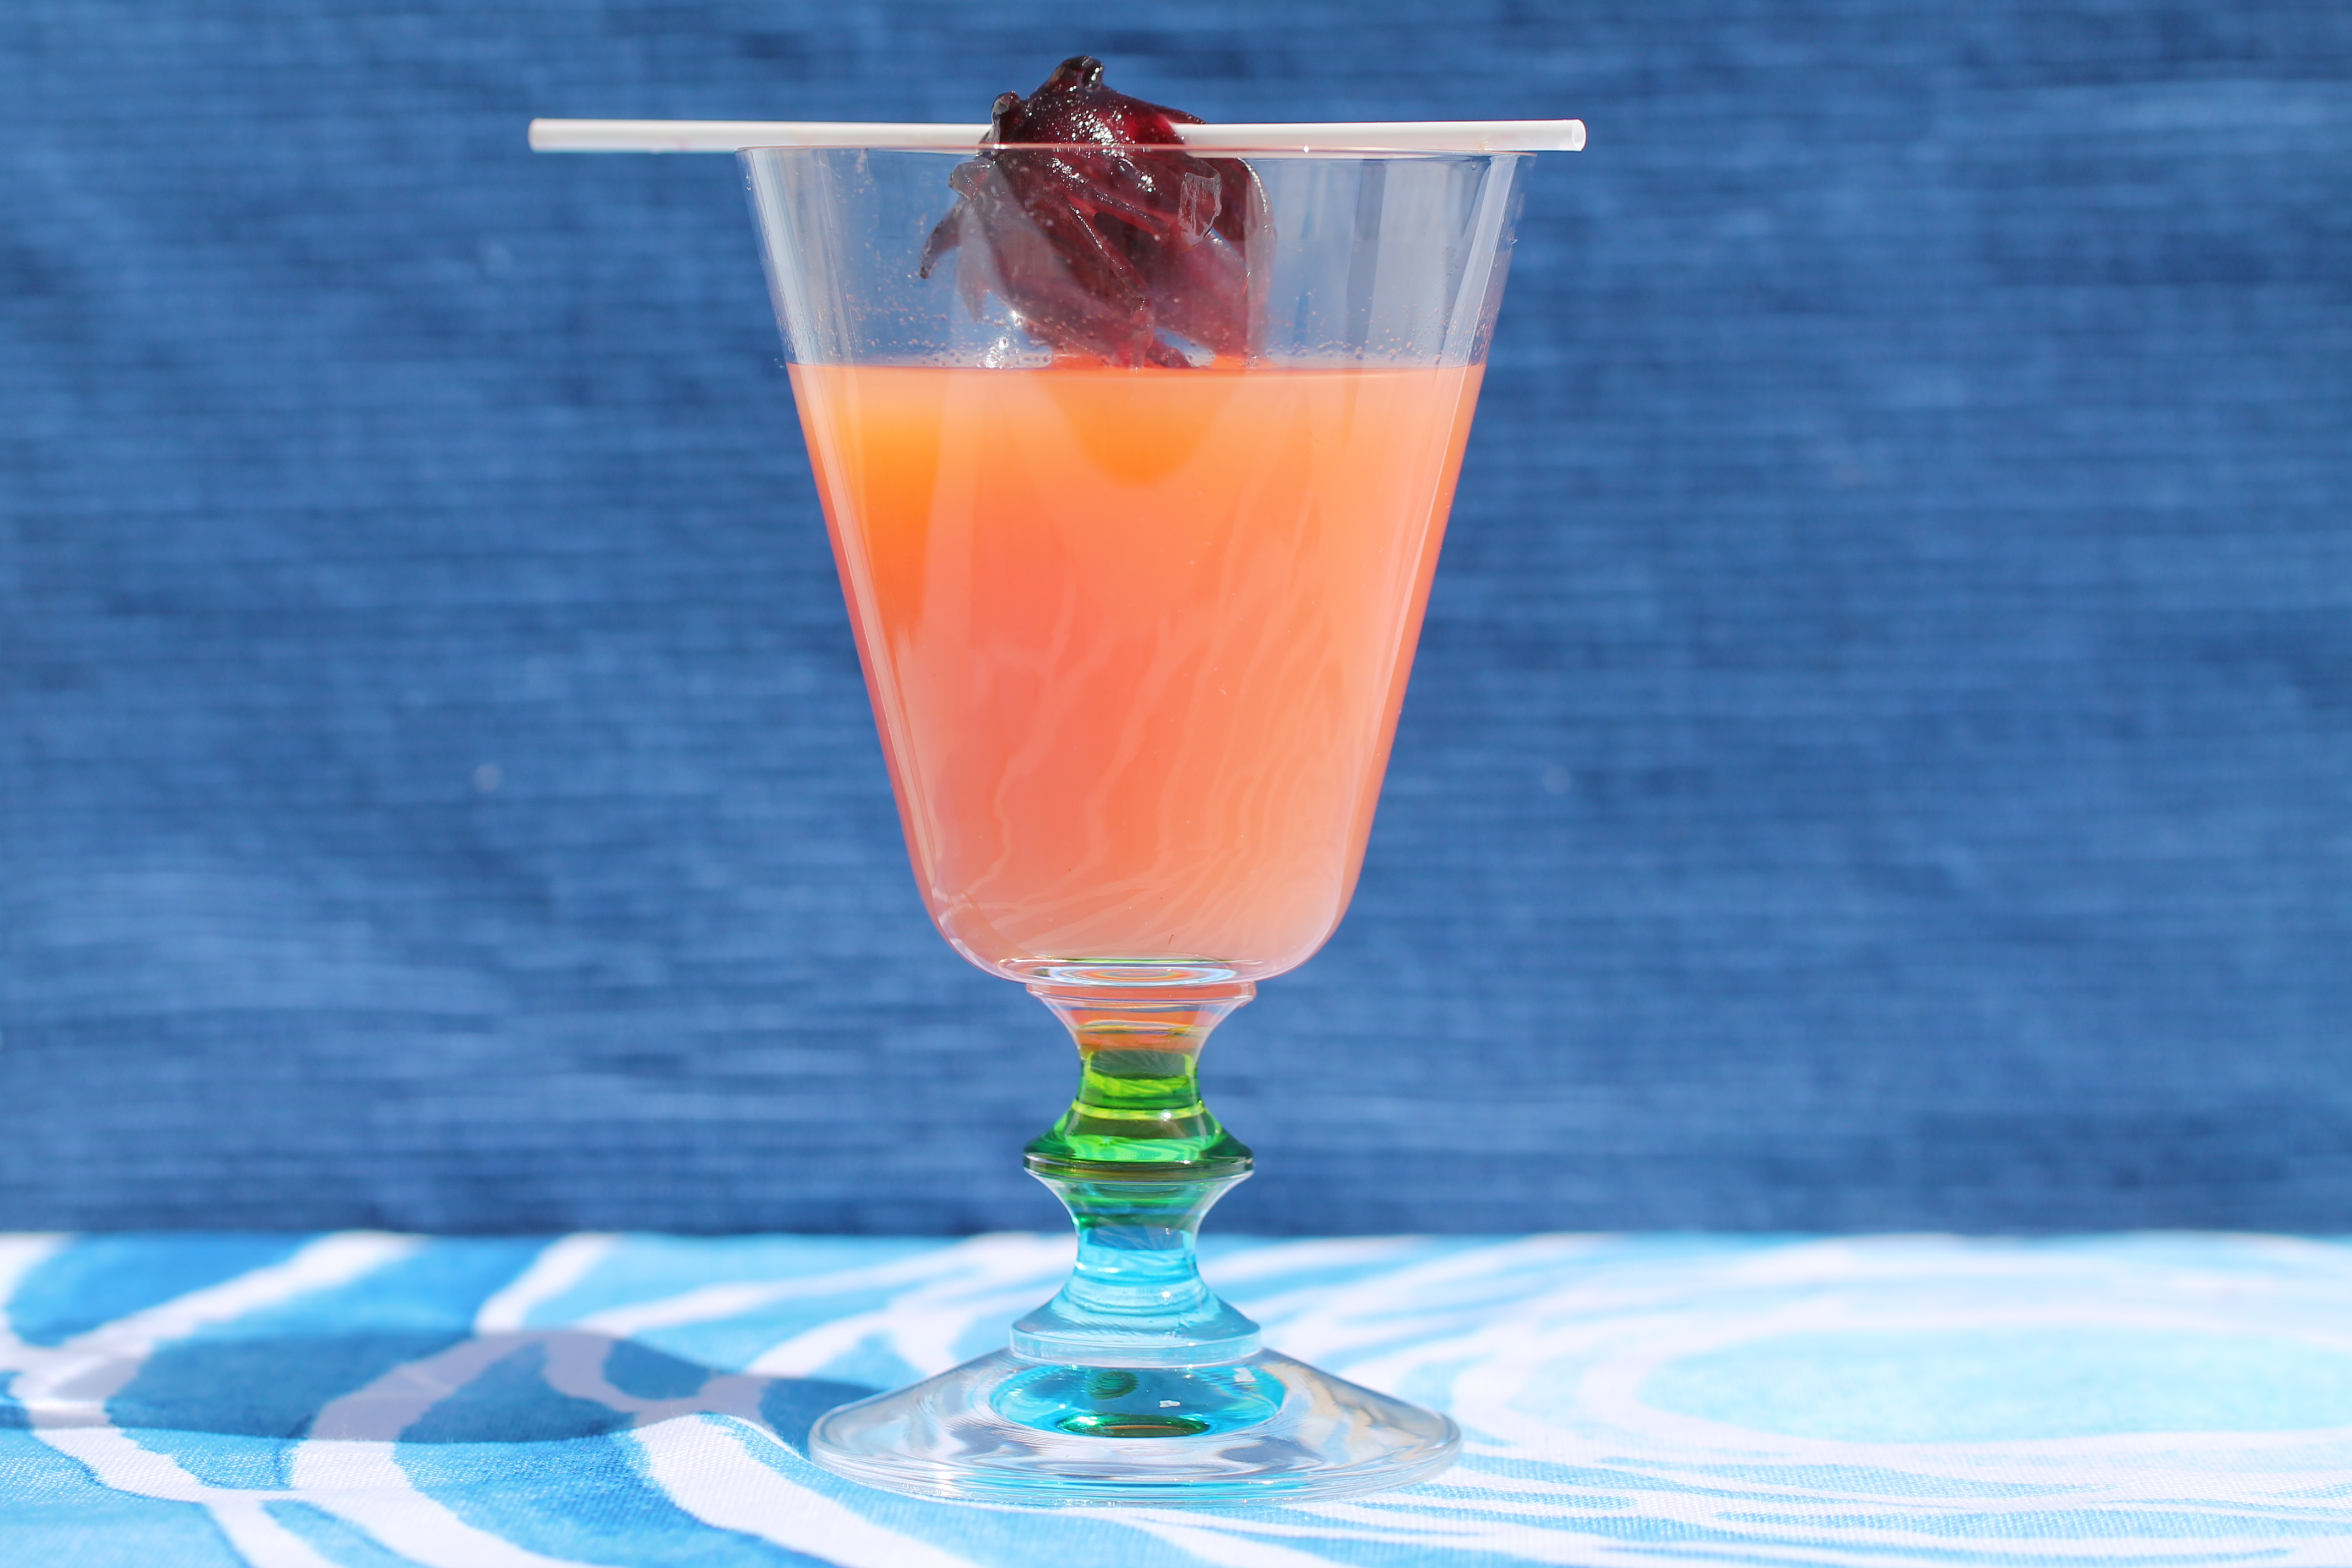 Safari Cocktail with Hibiscus Flower